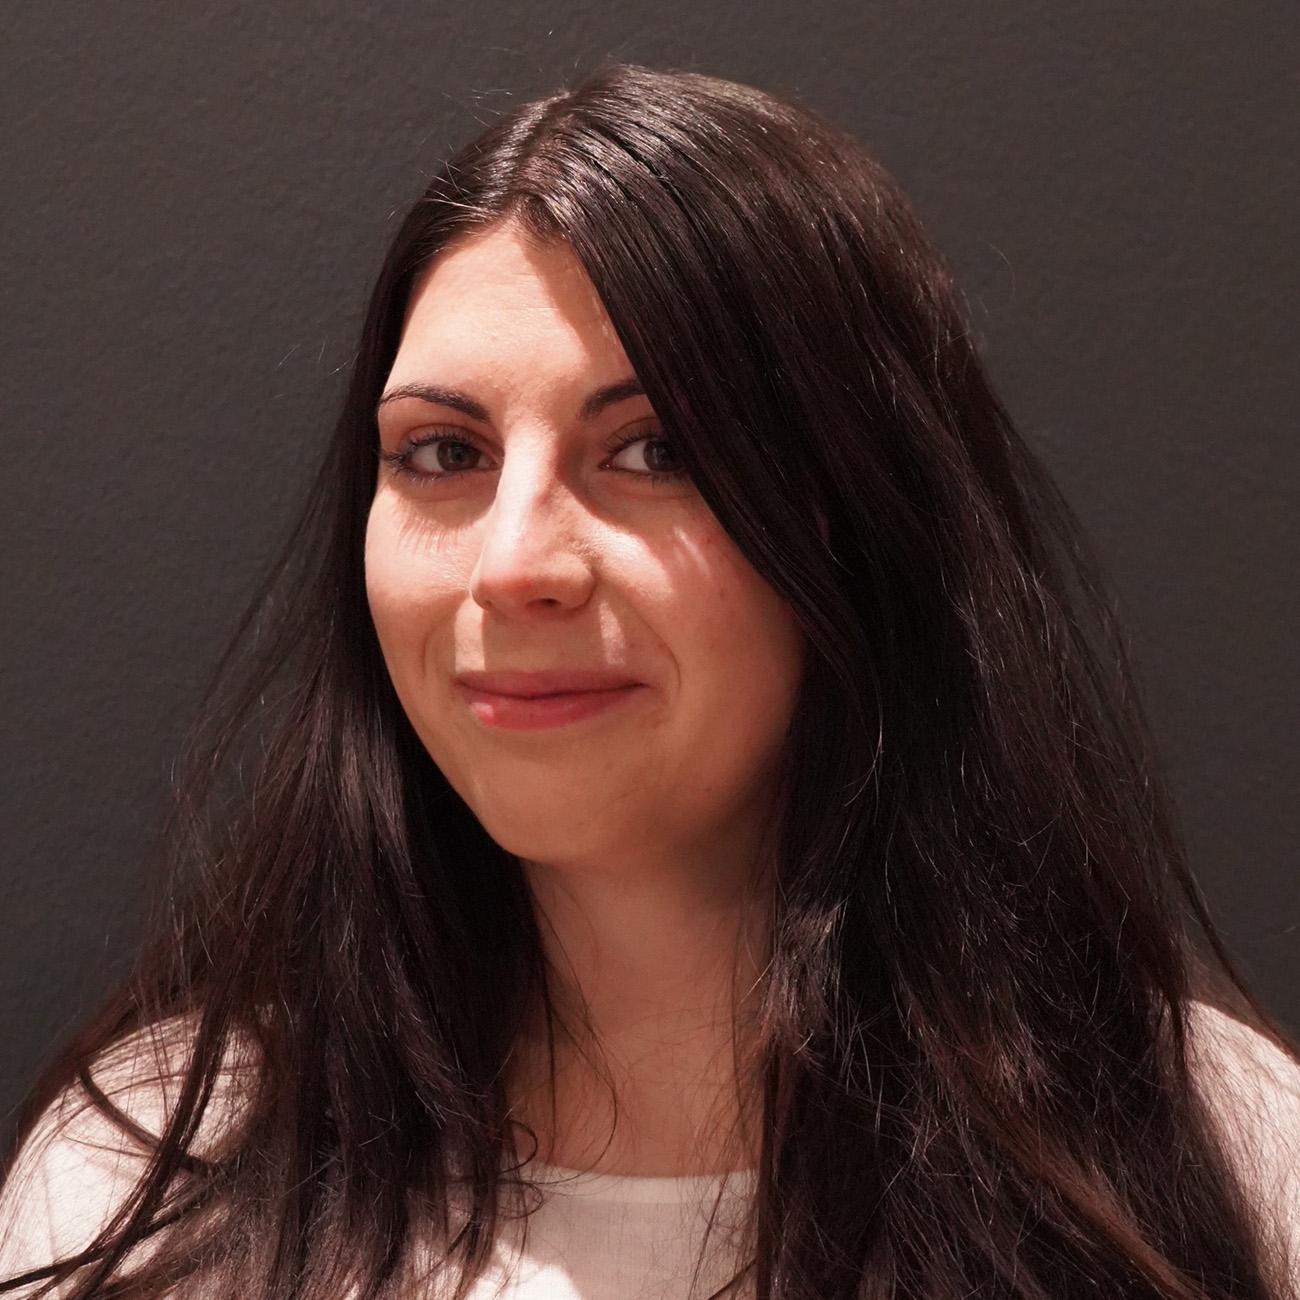 Maria Stamataki - Frauenarzt | Gynäkologikum 24 - Praxis für Gynäkologie München | Zentrum